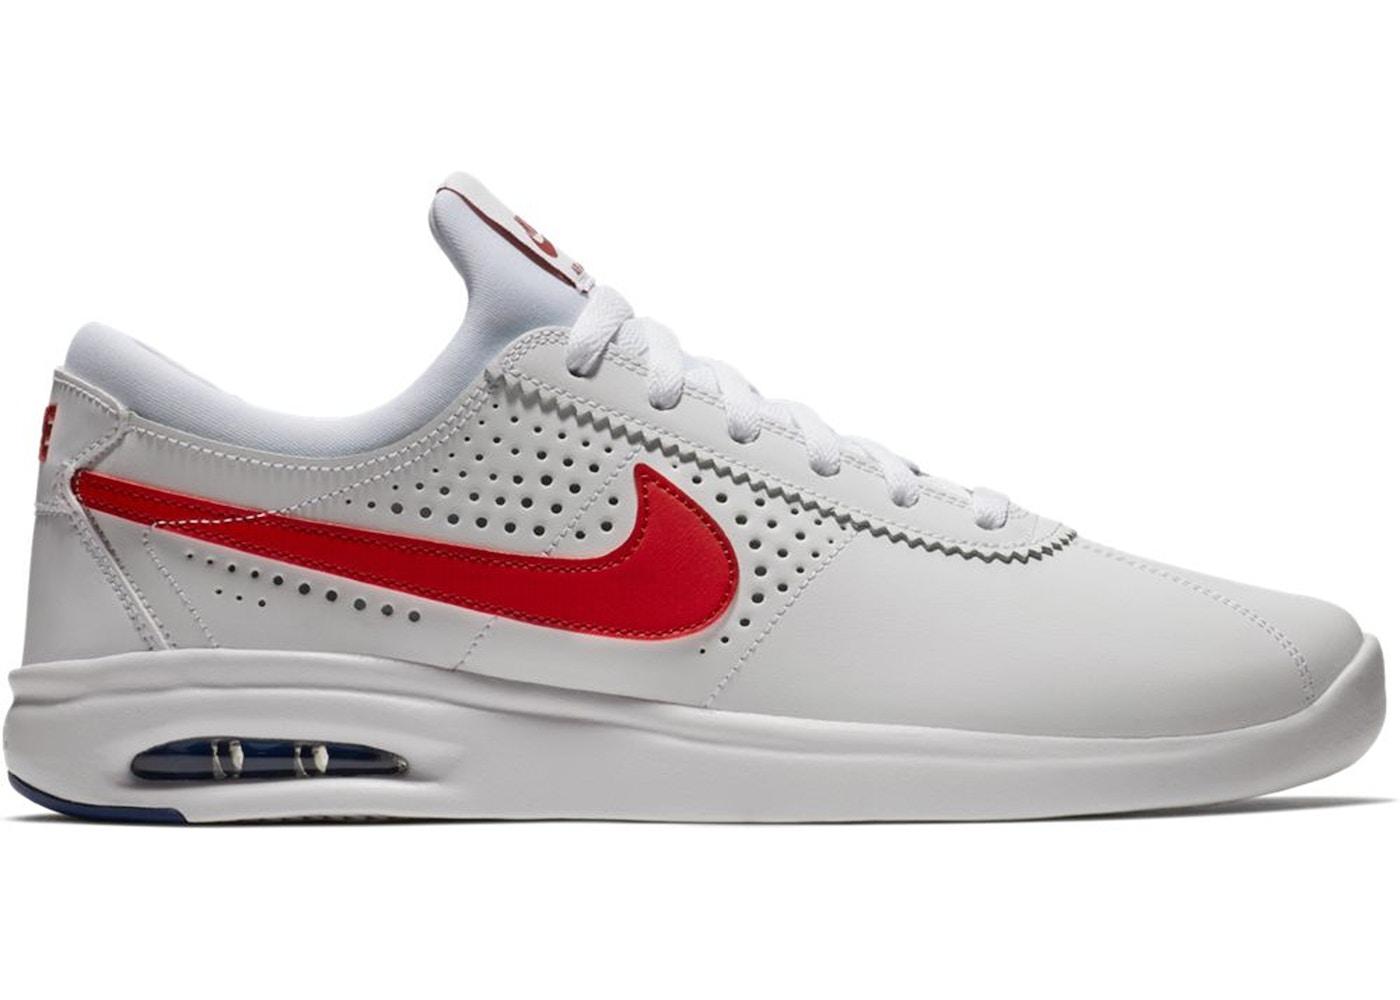 Juicio Desilusión Microordenador  Nike SB Air Max Bruin Vapor White Red - 882097-100